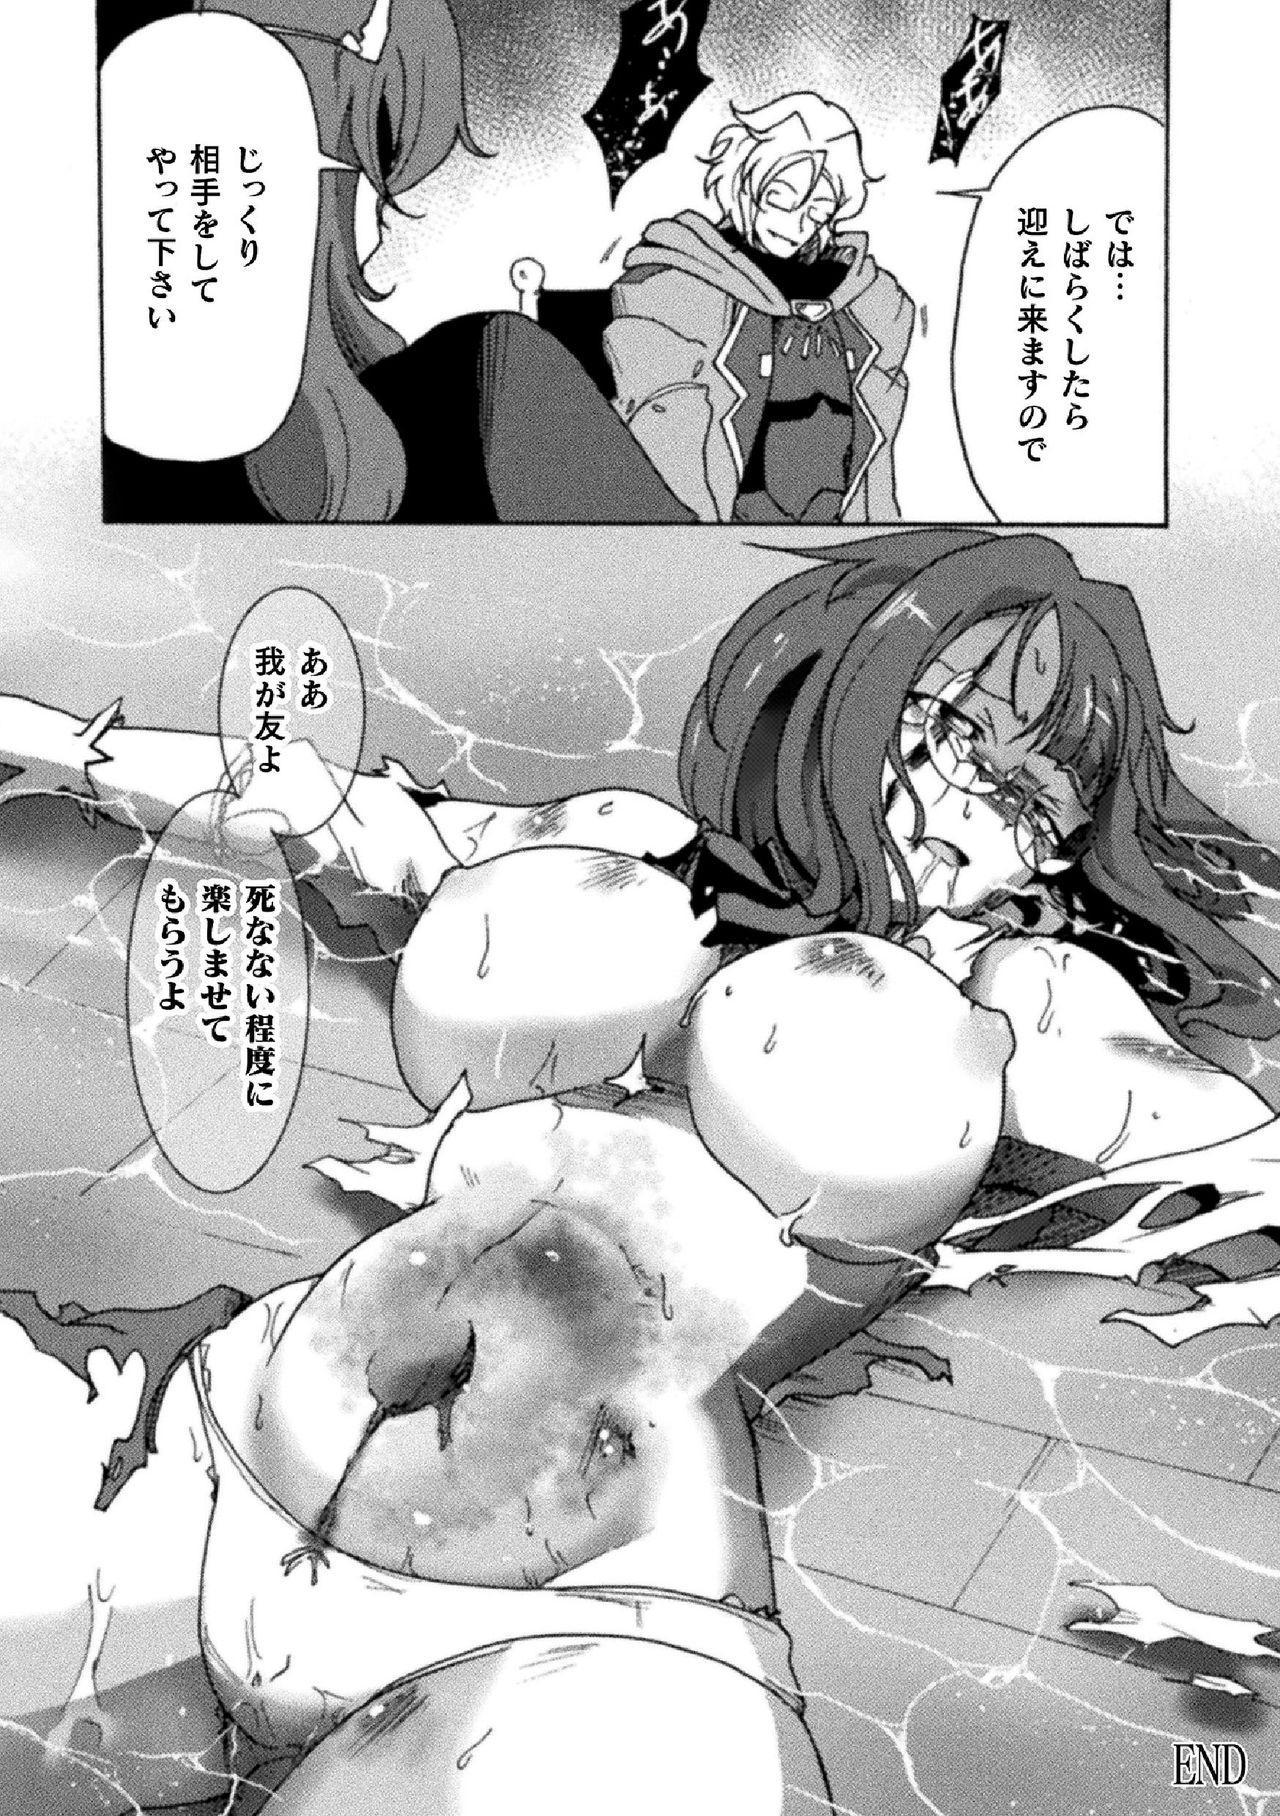 2D Comic Magazine Namaiki Onna ni HaraPun Seisai! Vol. 2 45